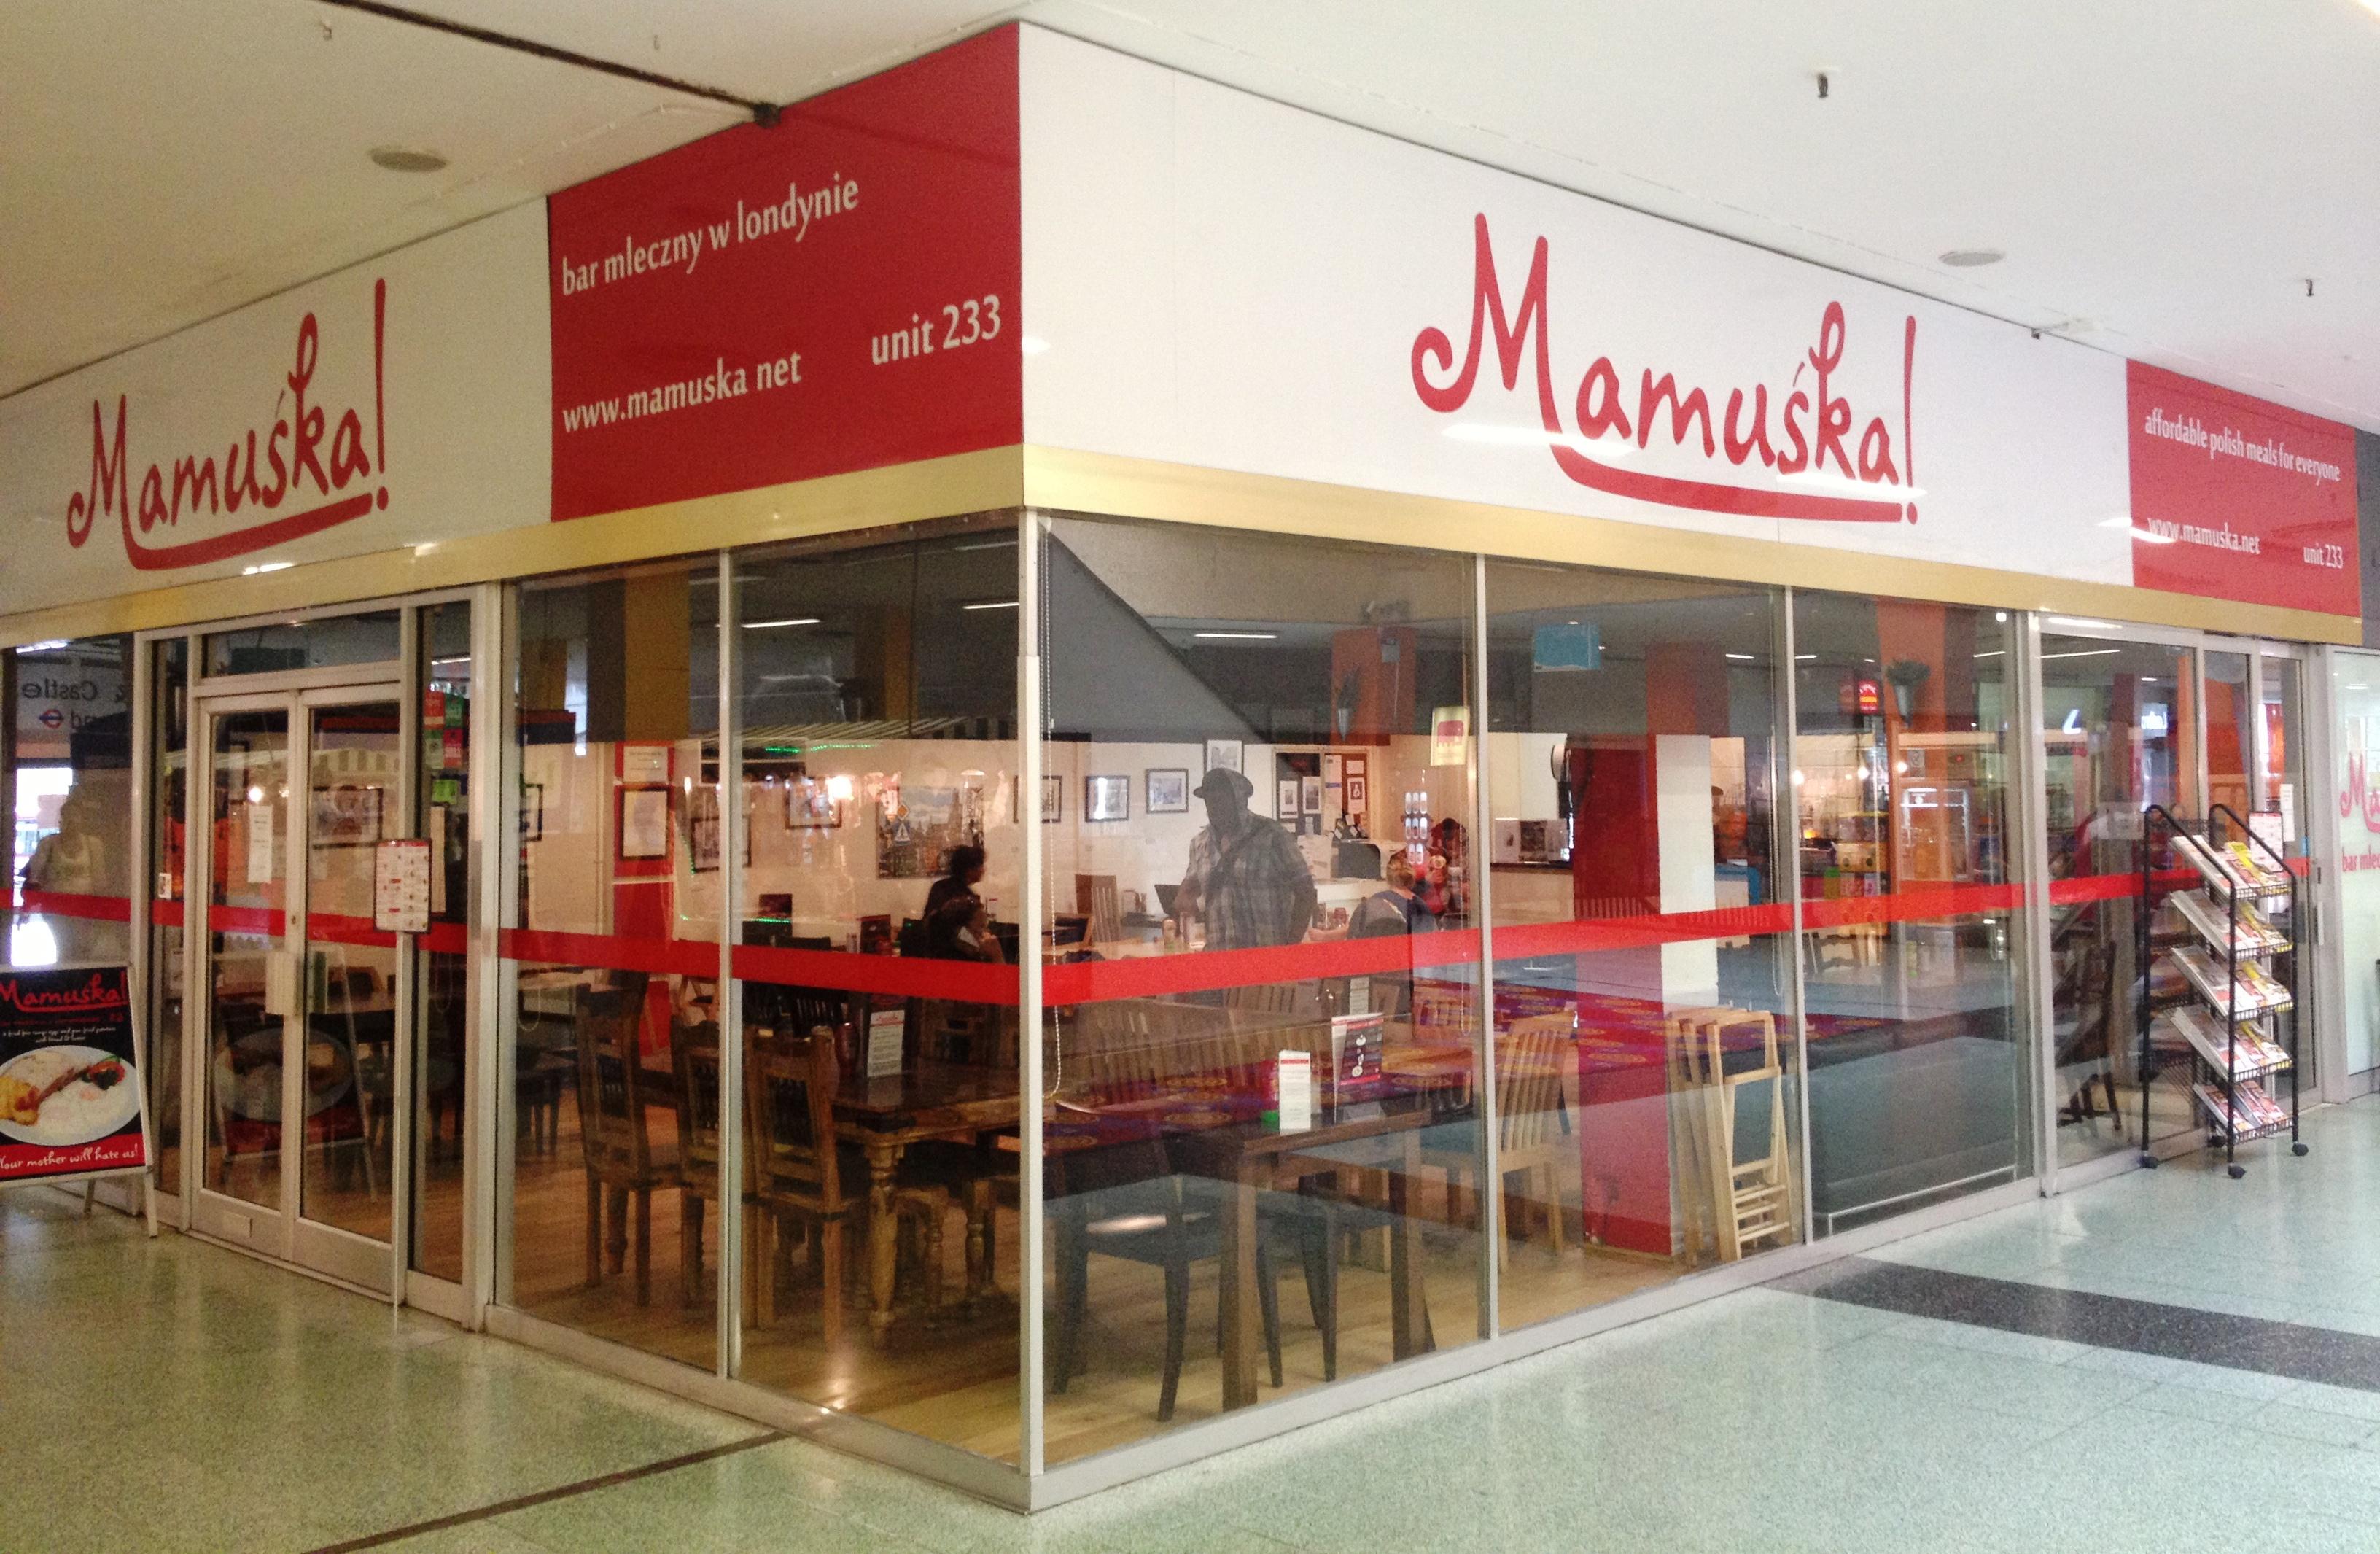 Mamuska - kenningtonrunoff.com